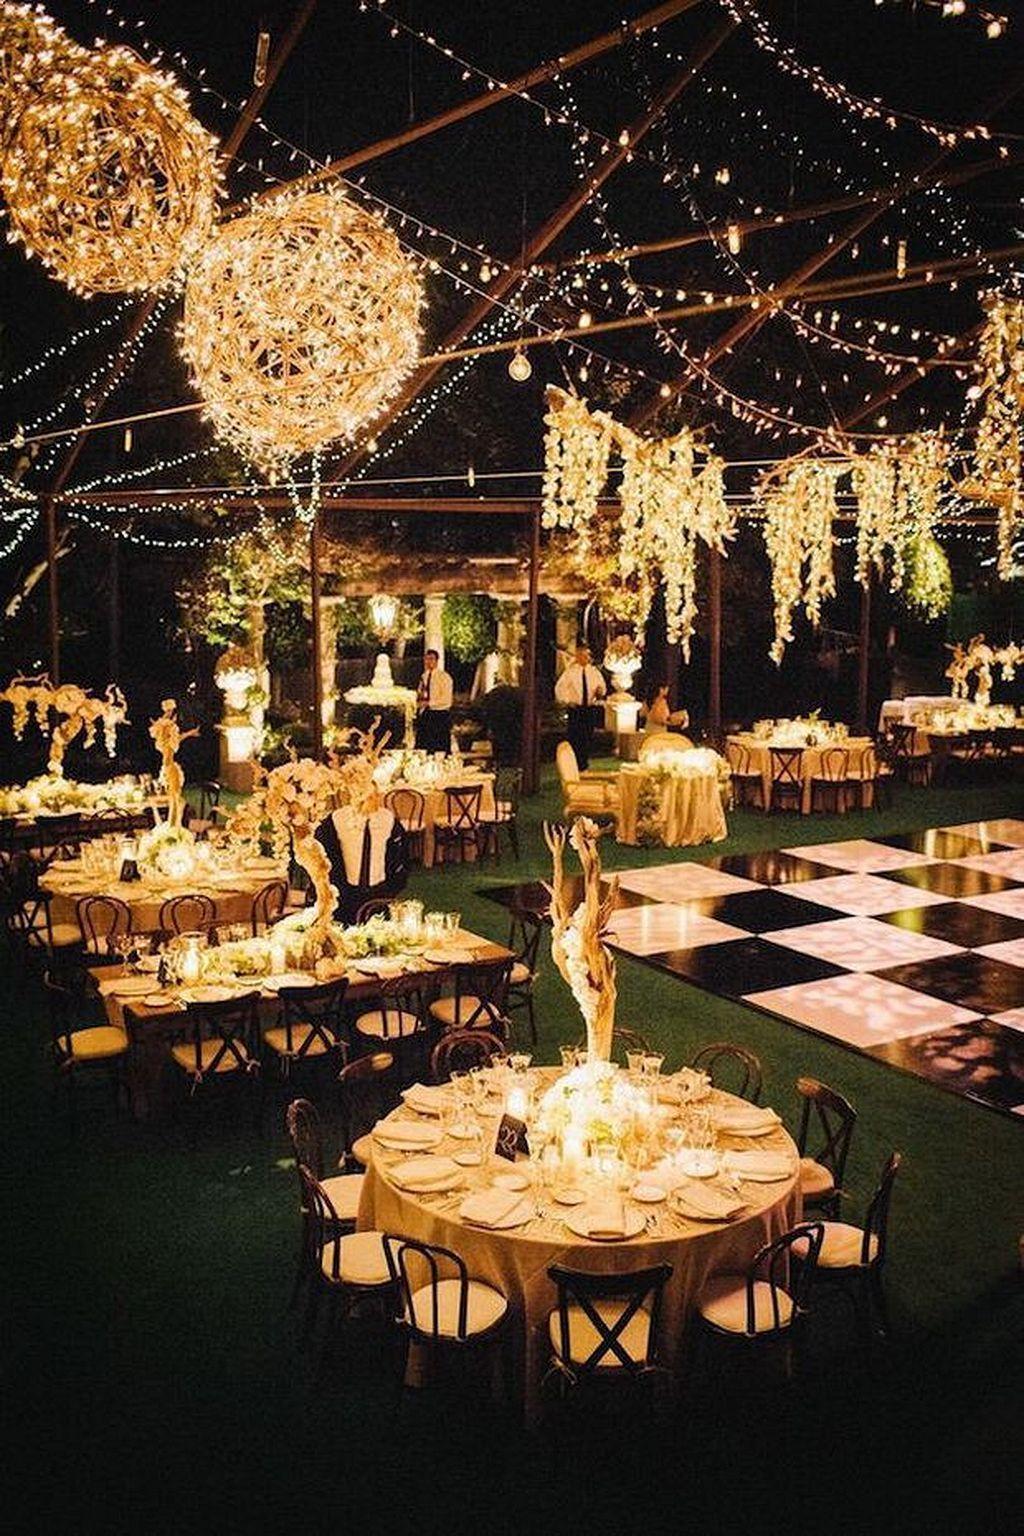 Wedding reception decoration ideas with lights  Cool  Night Wedding Reception Decor Ideas weddmagz